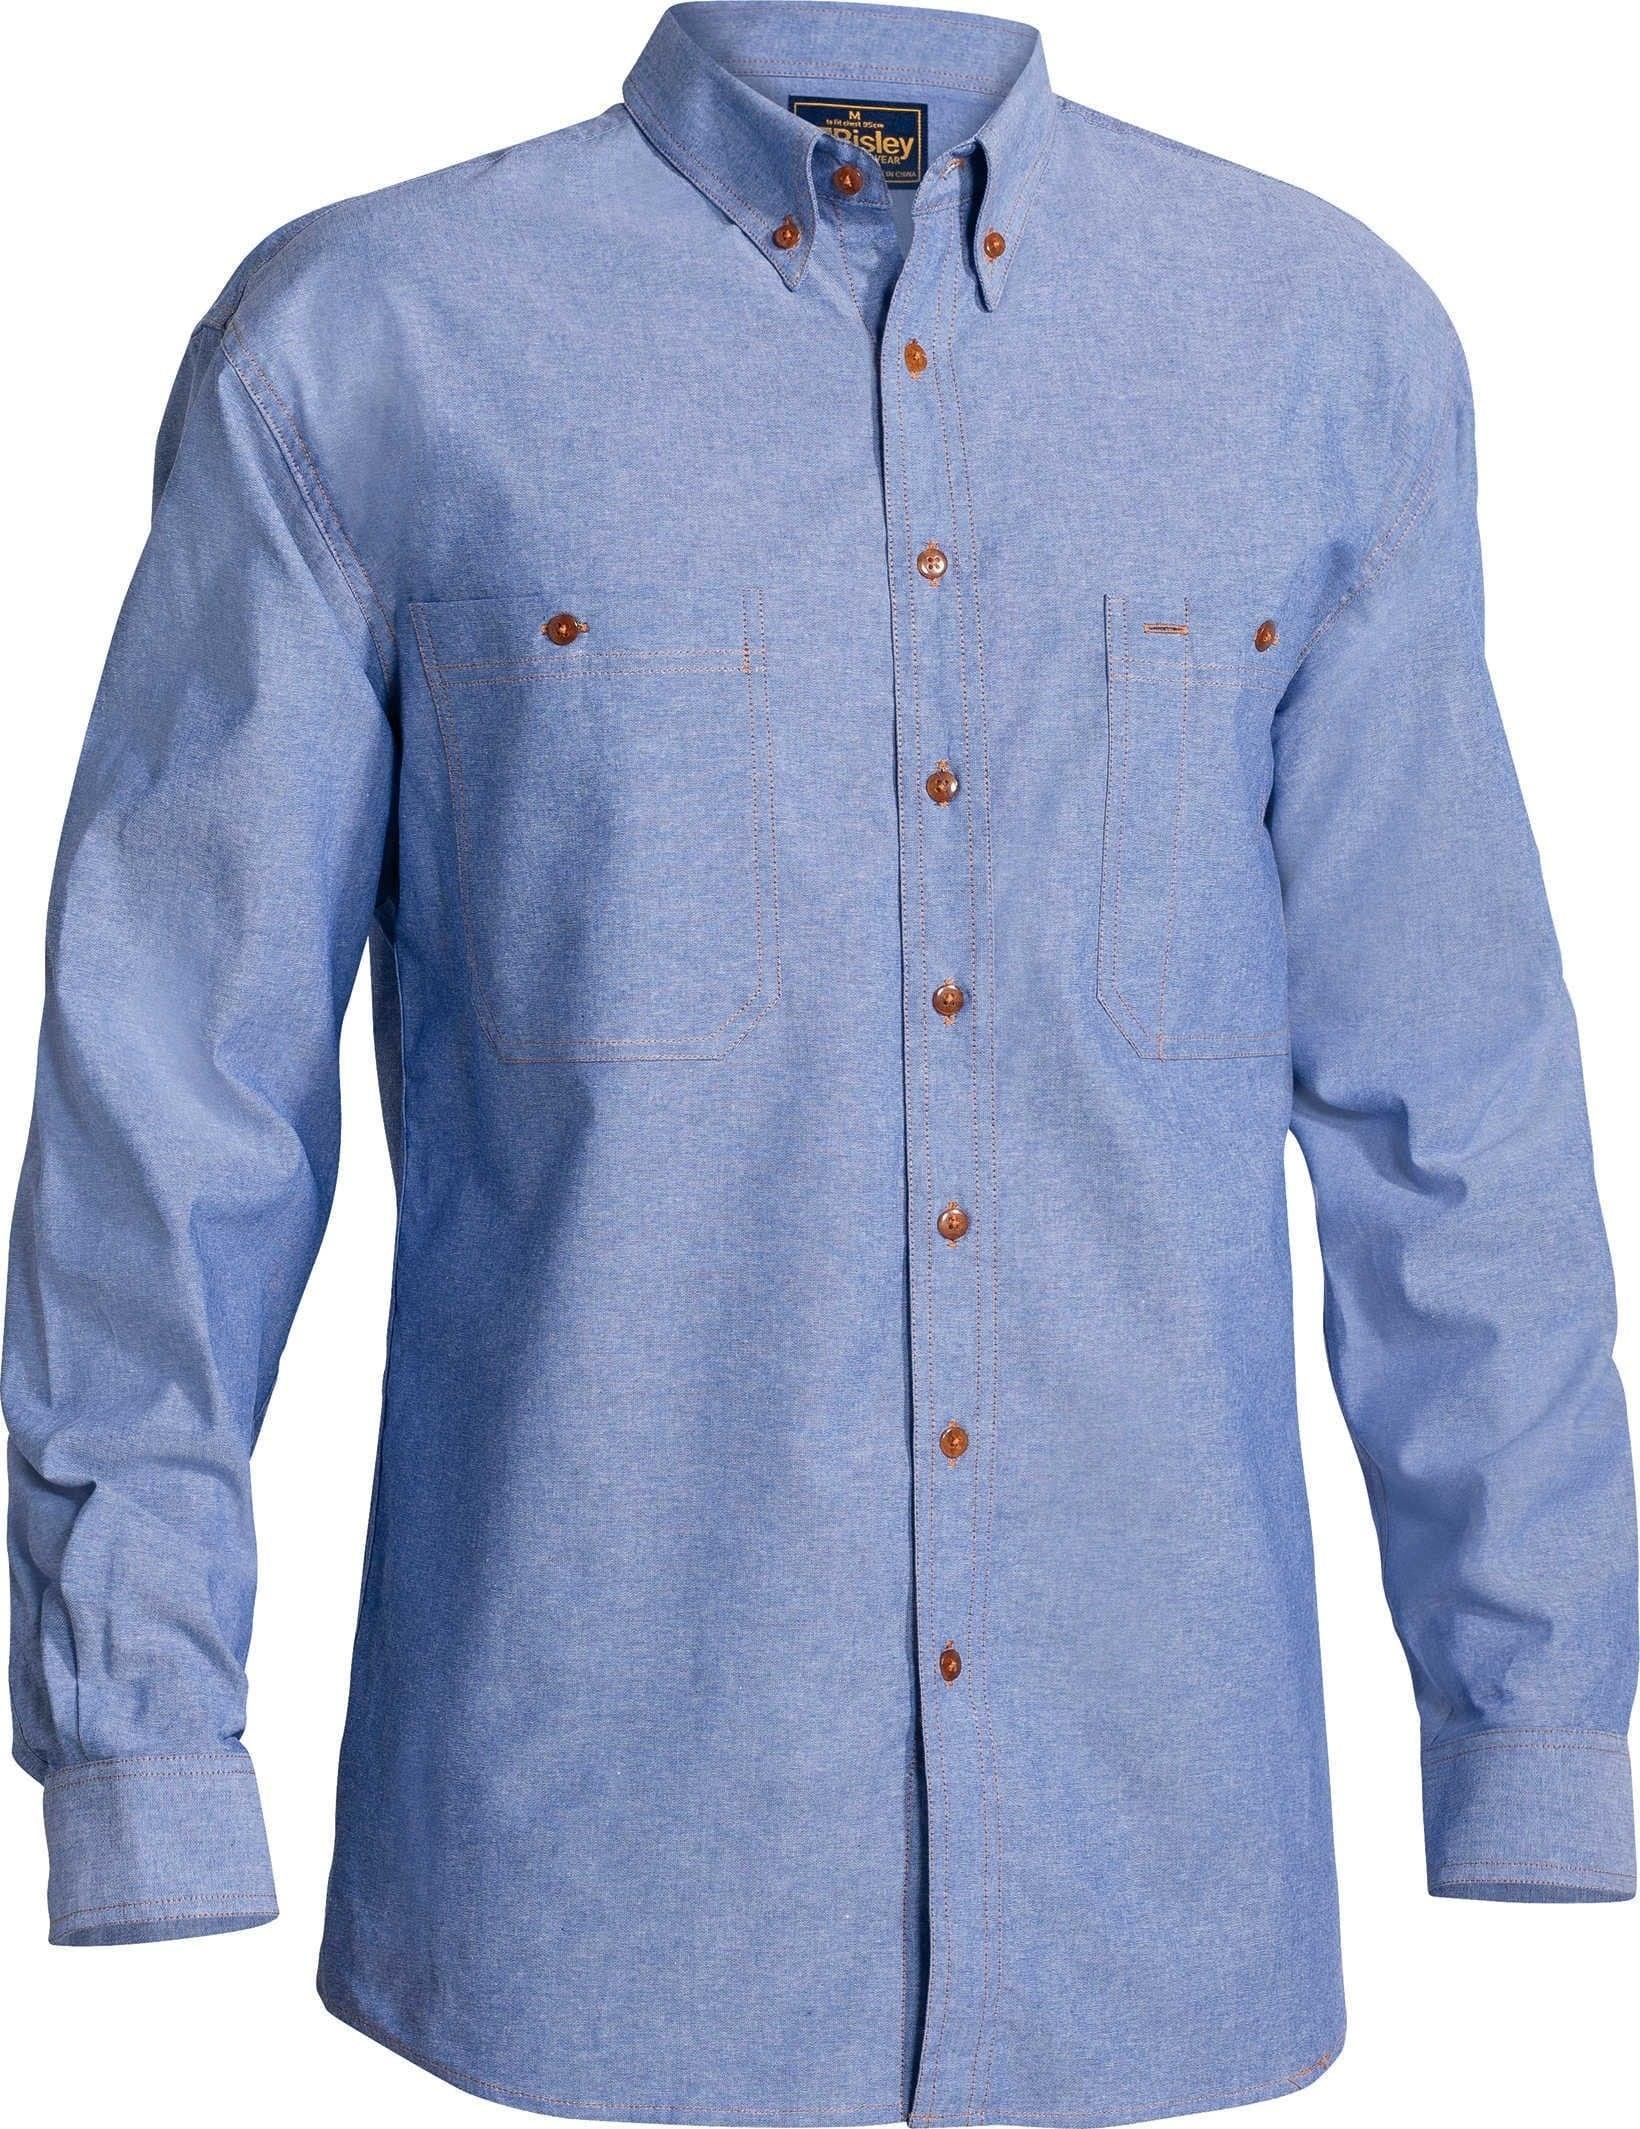 Bisley Chambray Shirt - Long Sleeve - Blue (B76407)